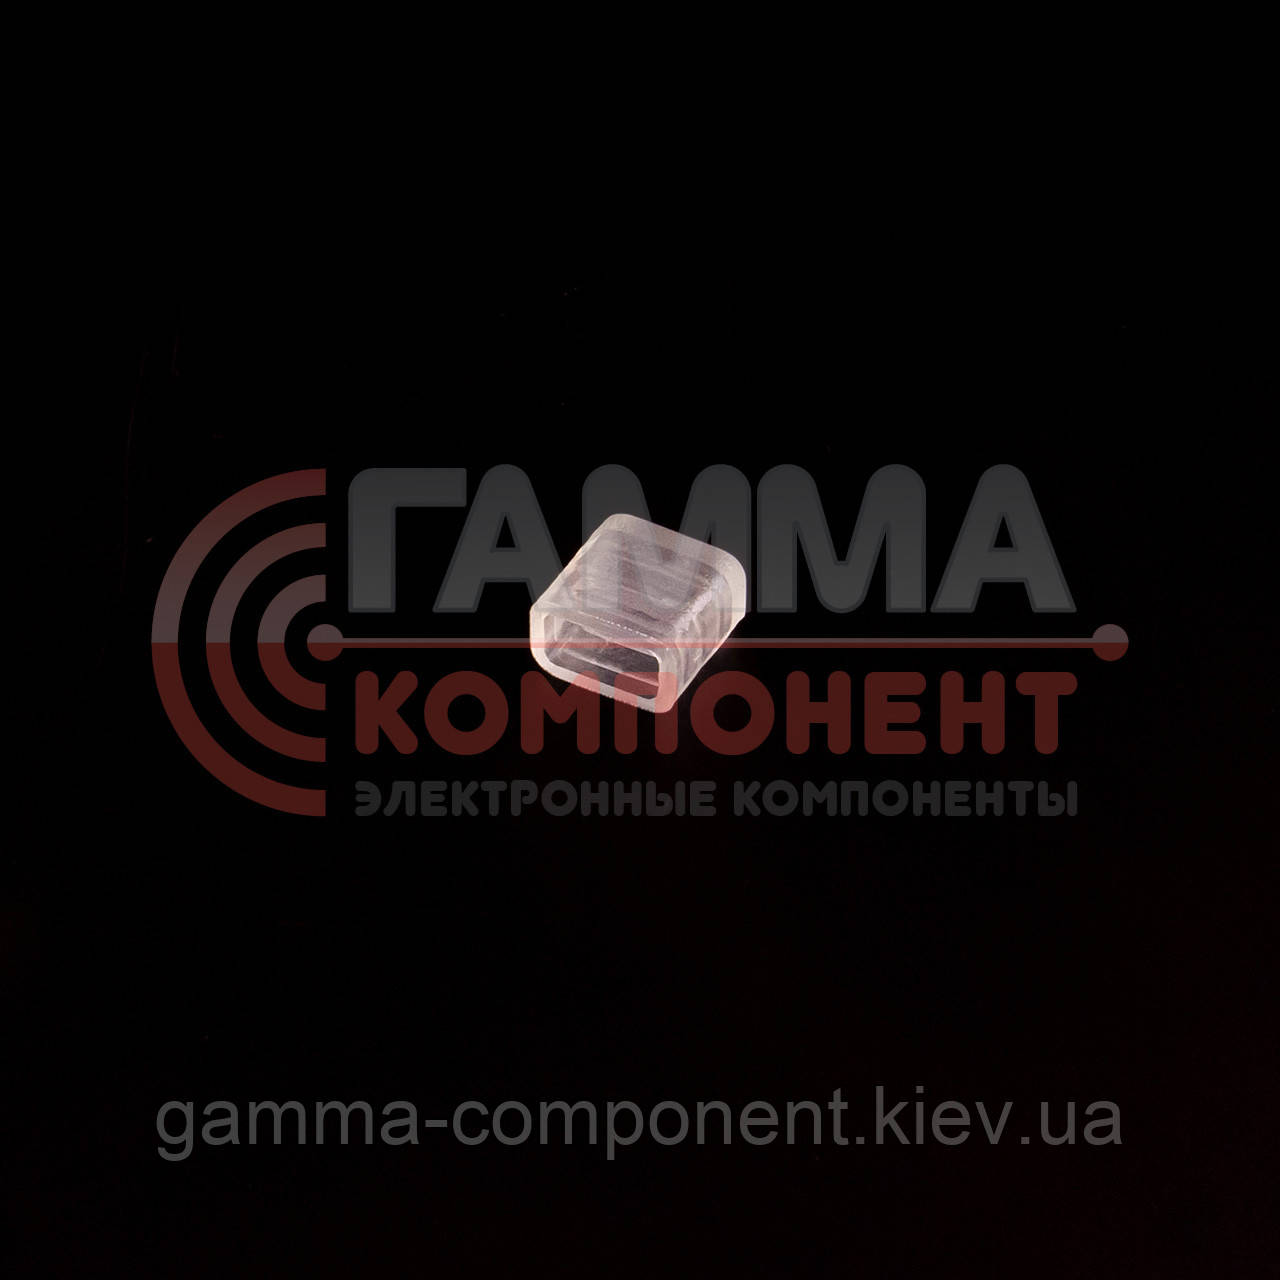 Заглушка для светодиодной ленты 220B RGB AVT smd 5050-60 лед/м